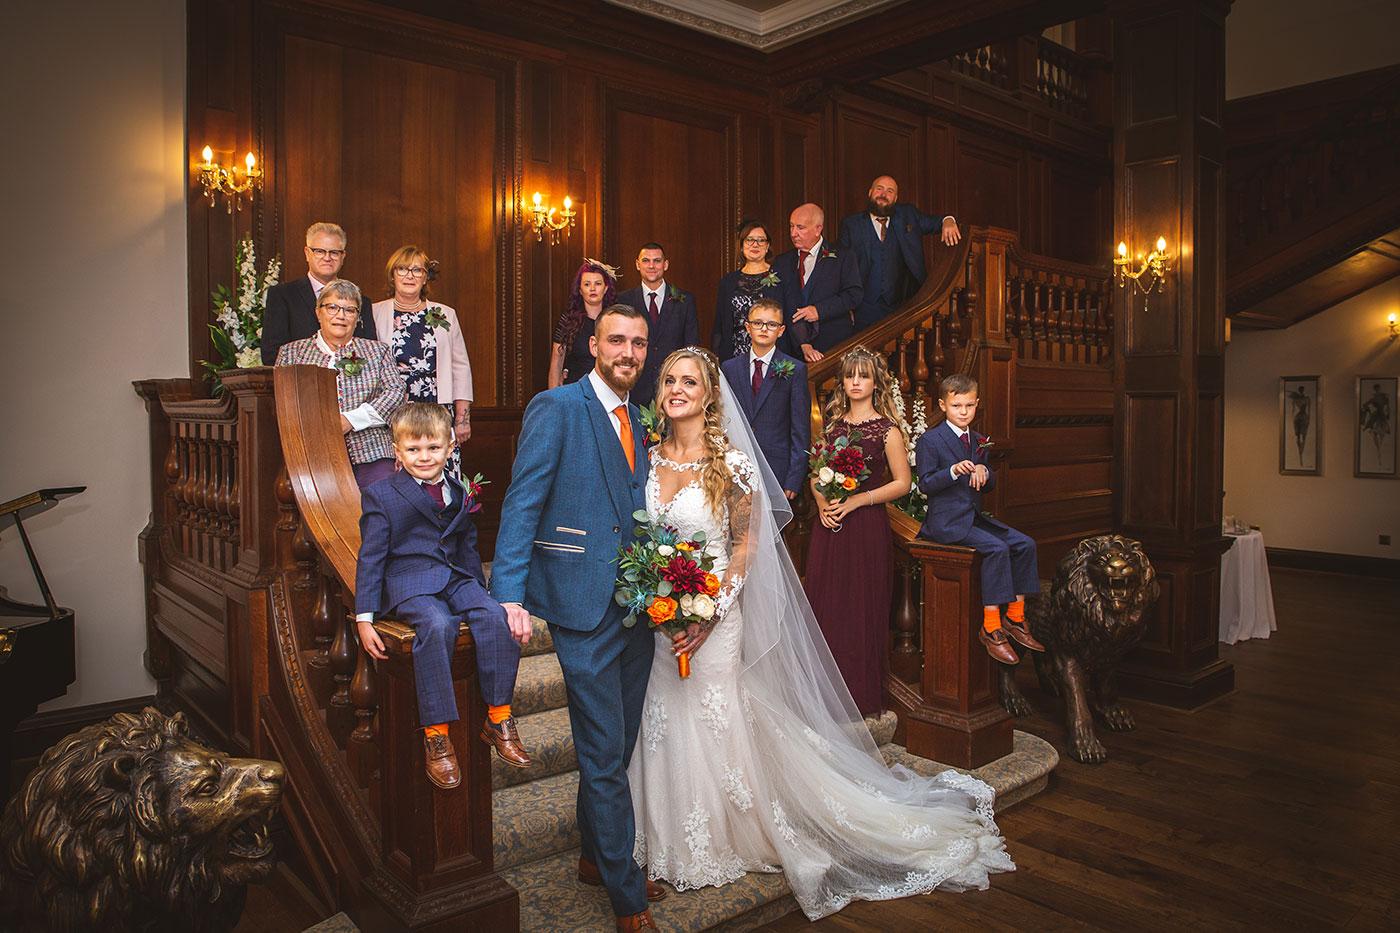 Bourton Hall Wedding Venue